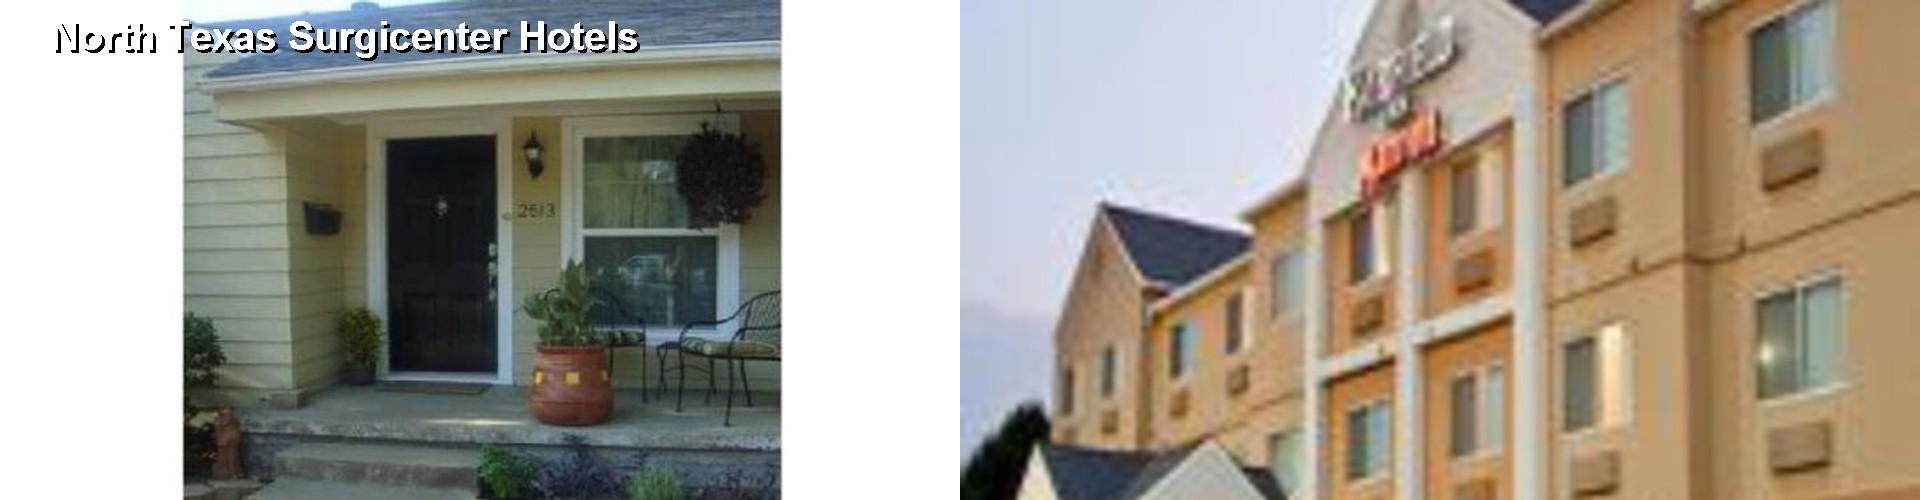 37 Hotels Near North Texas Surgicenter In Wichita Falls Tx